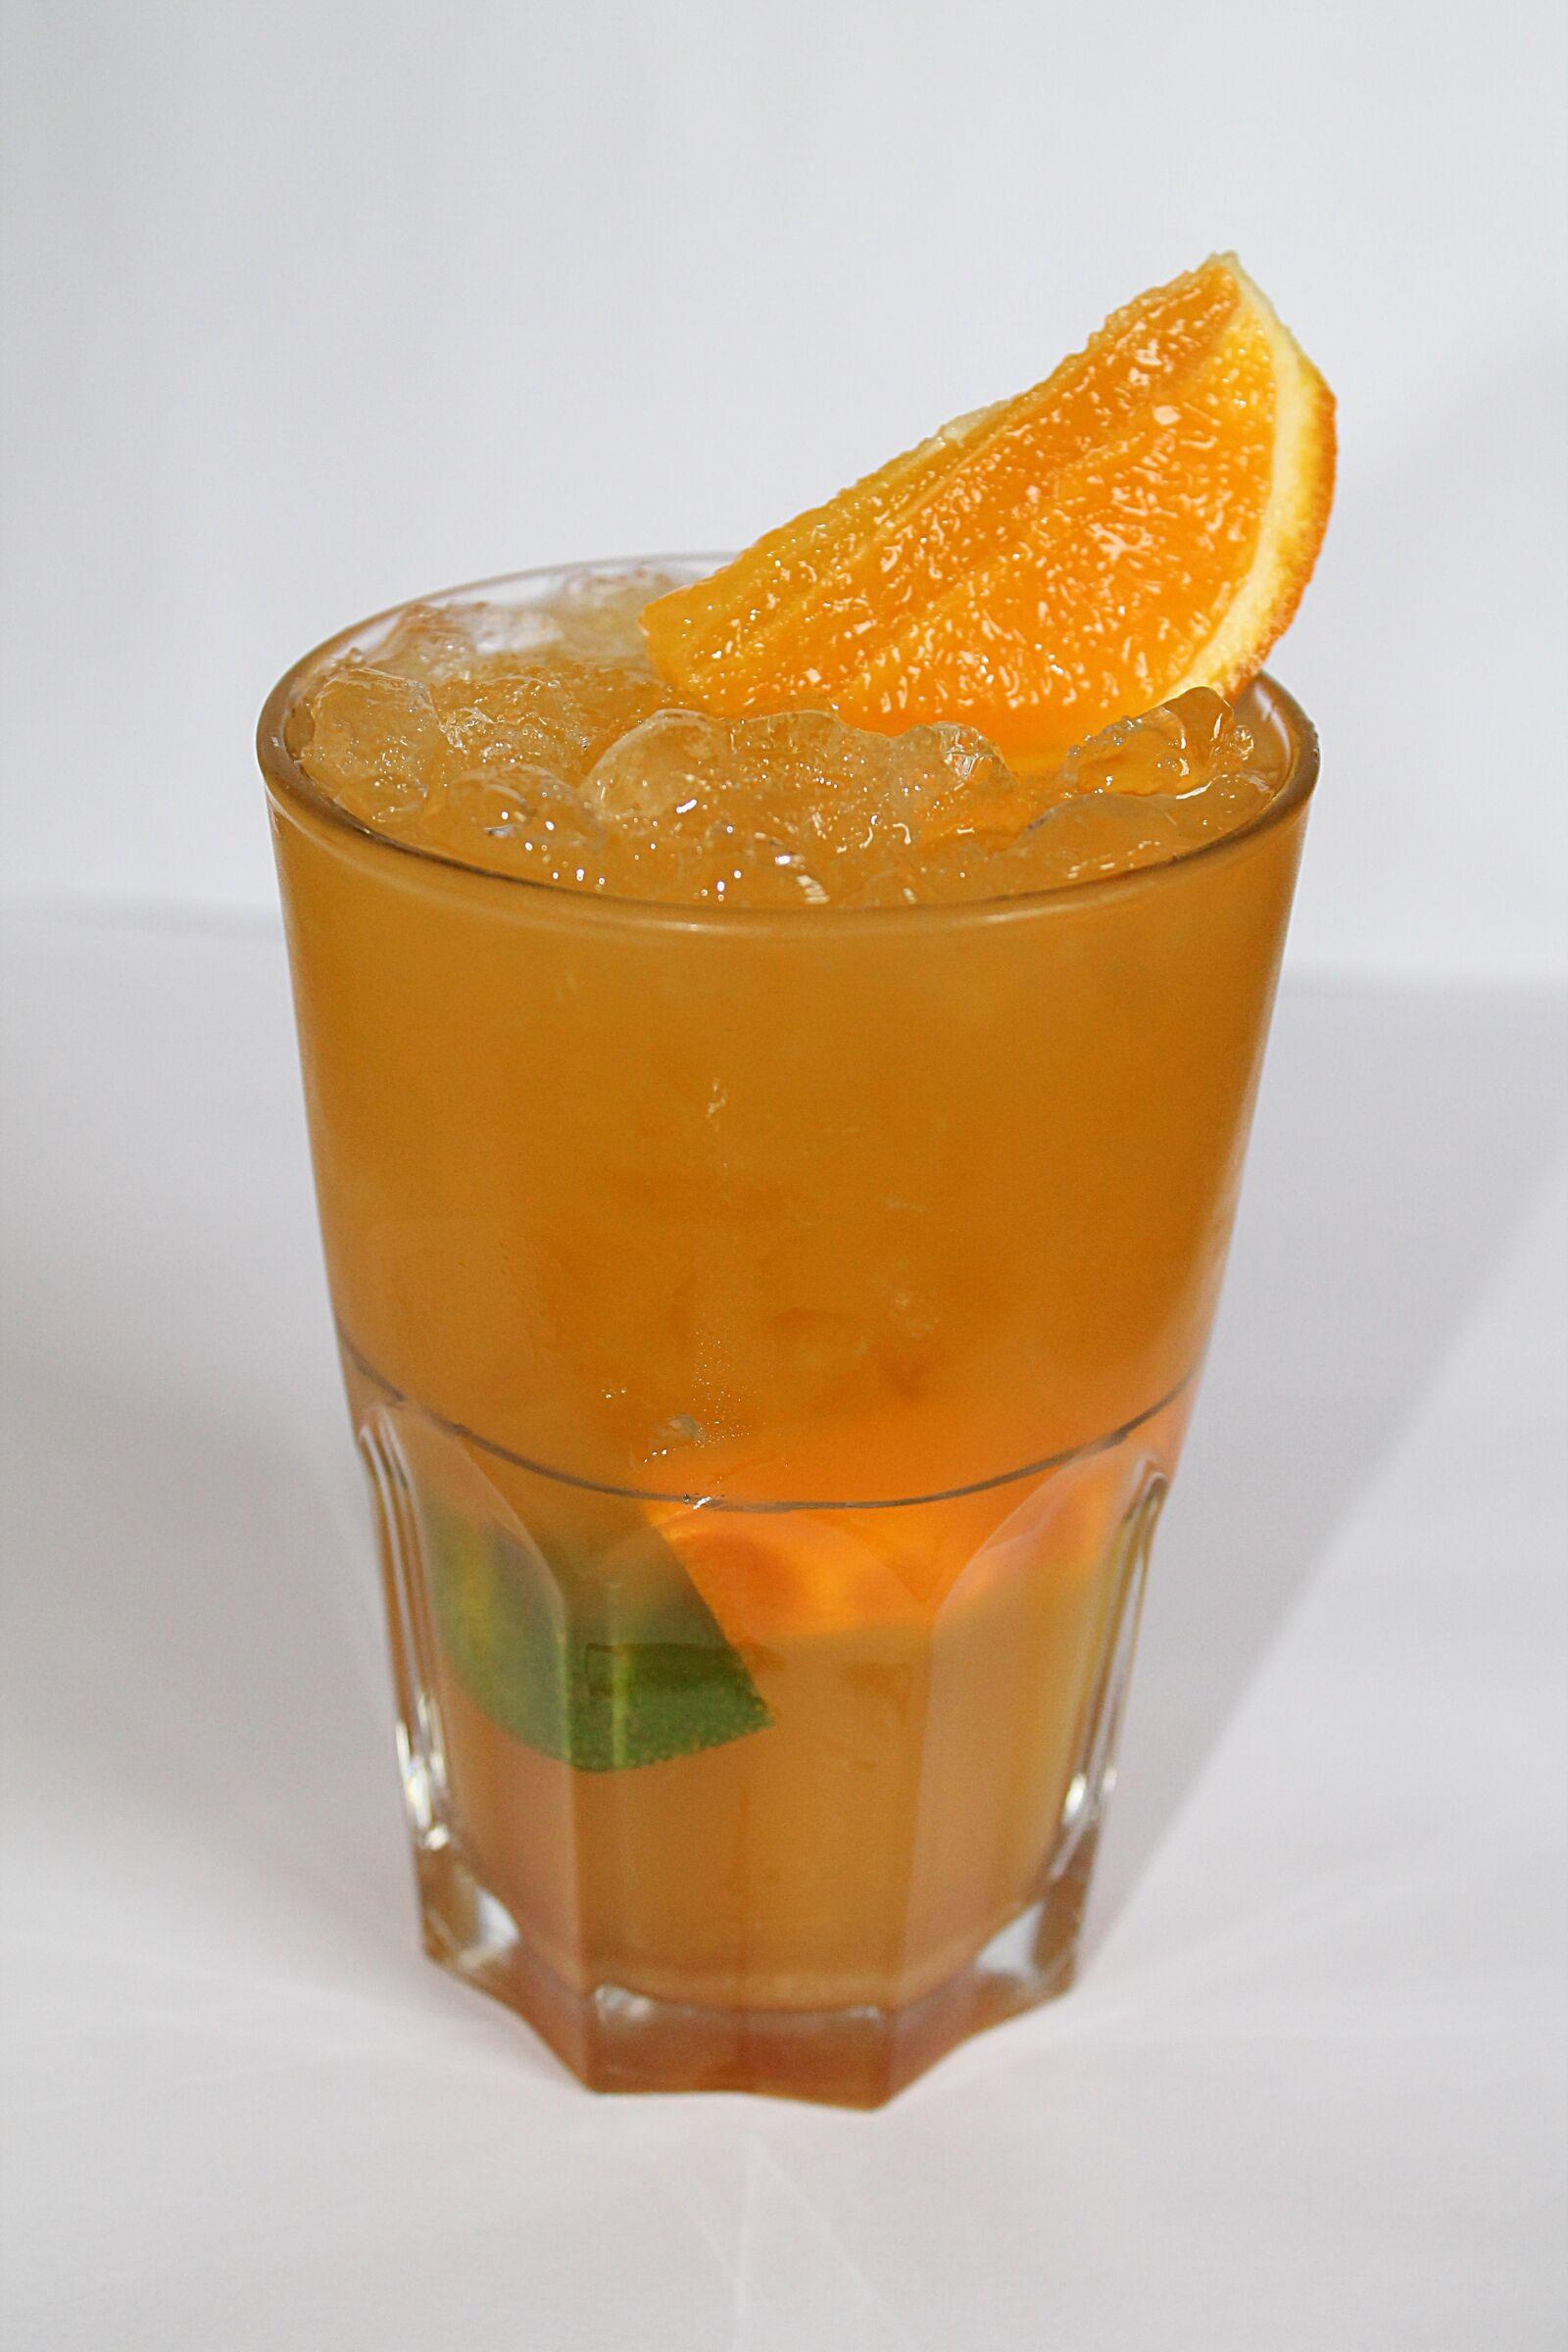 "Canon EOS 1100D (EOS Rebel T3 / EOS Kiss X50) sample photo. ""Cocktail, alcohol, orange"" photography"